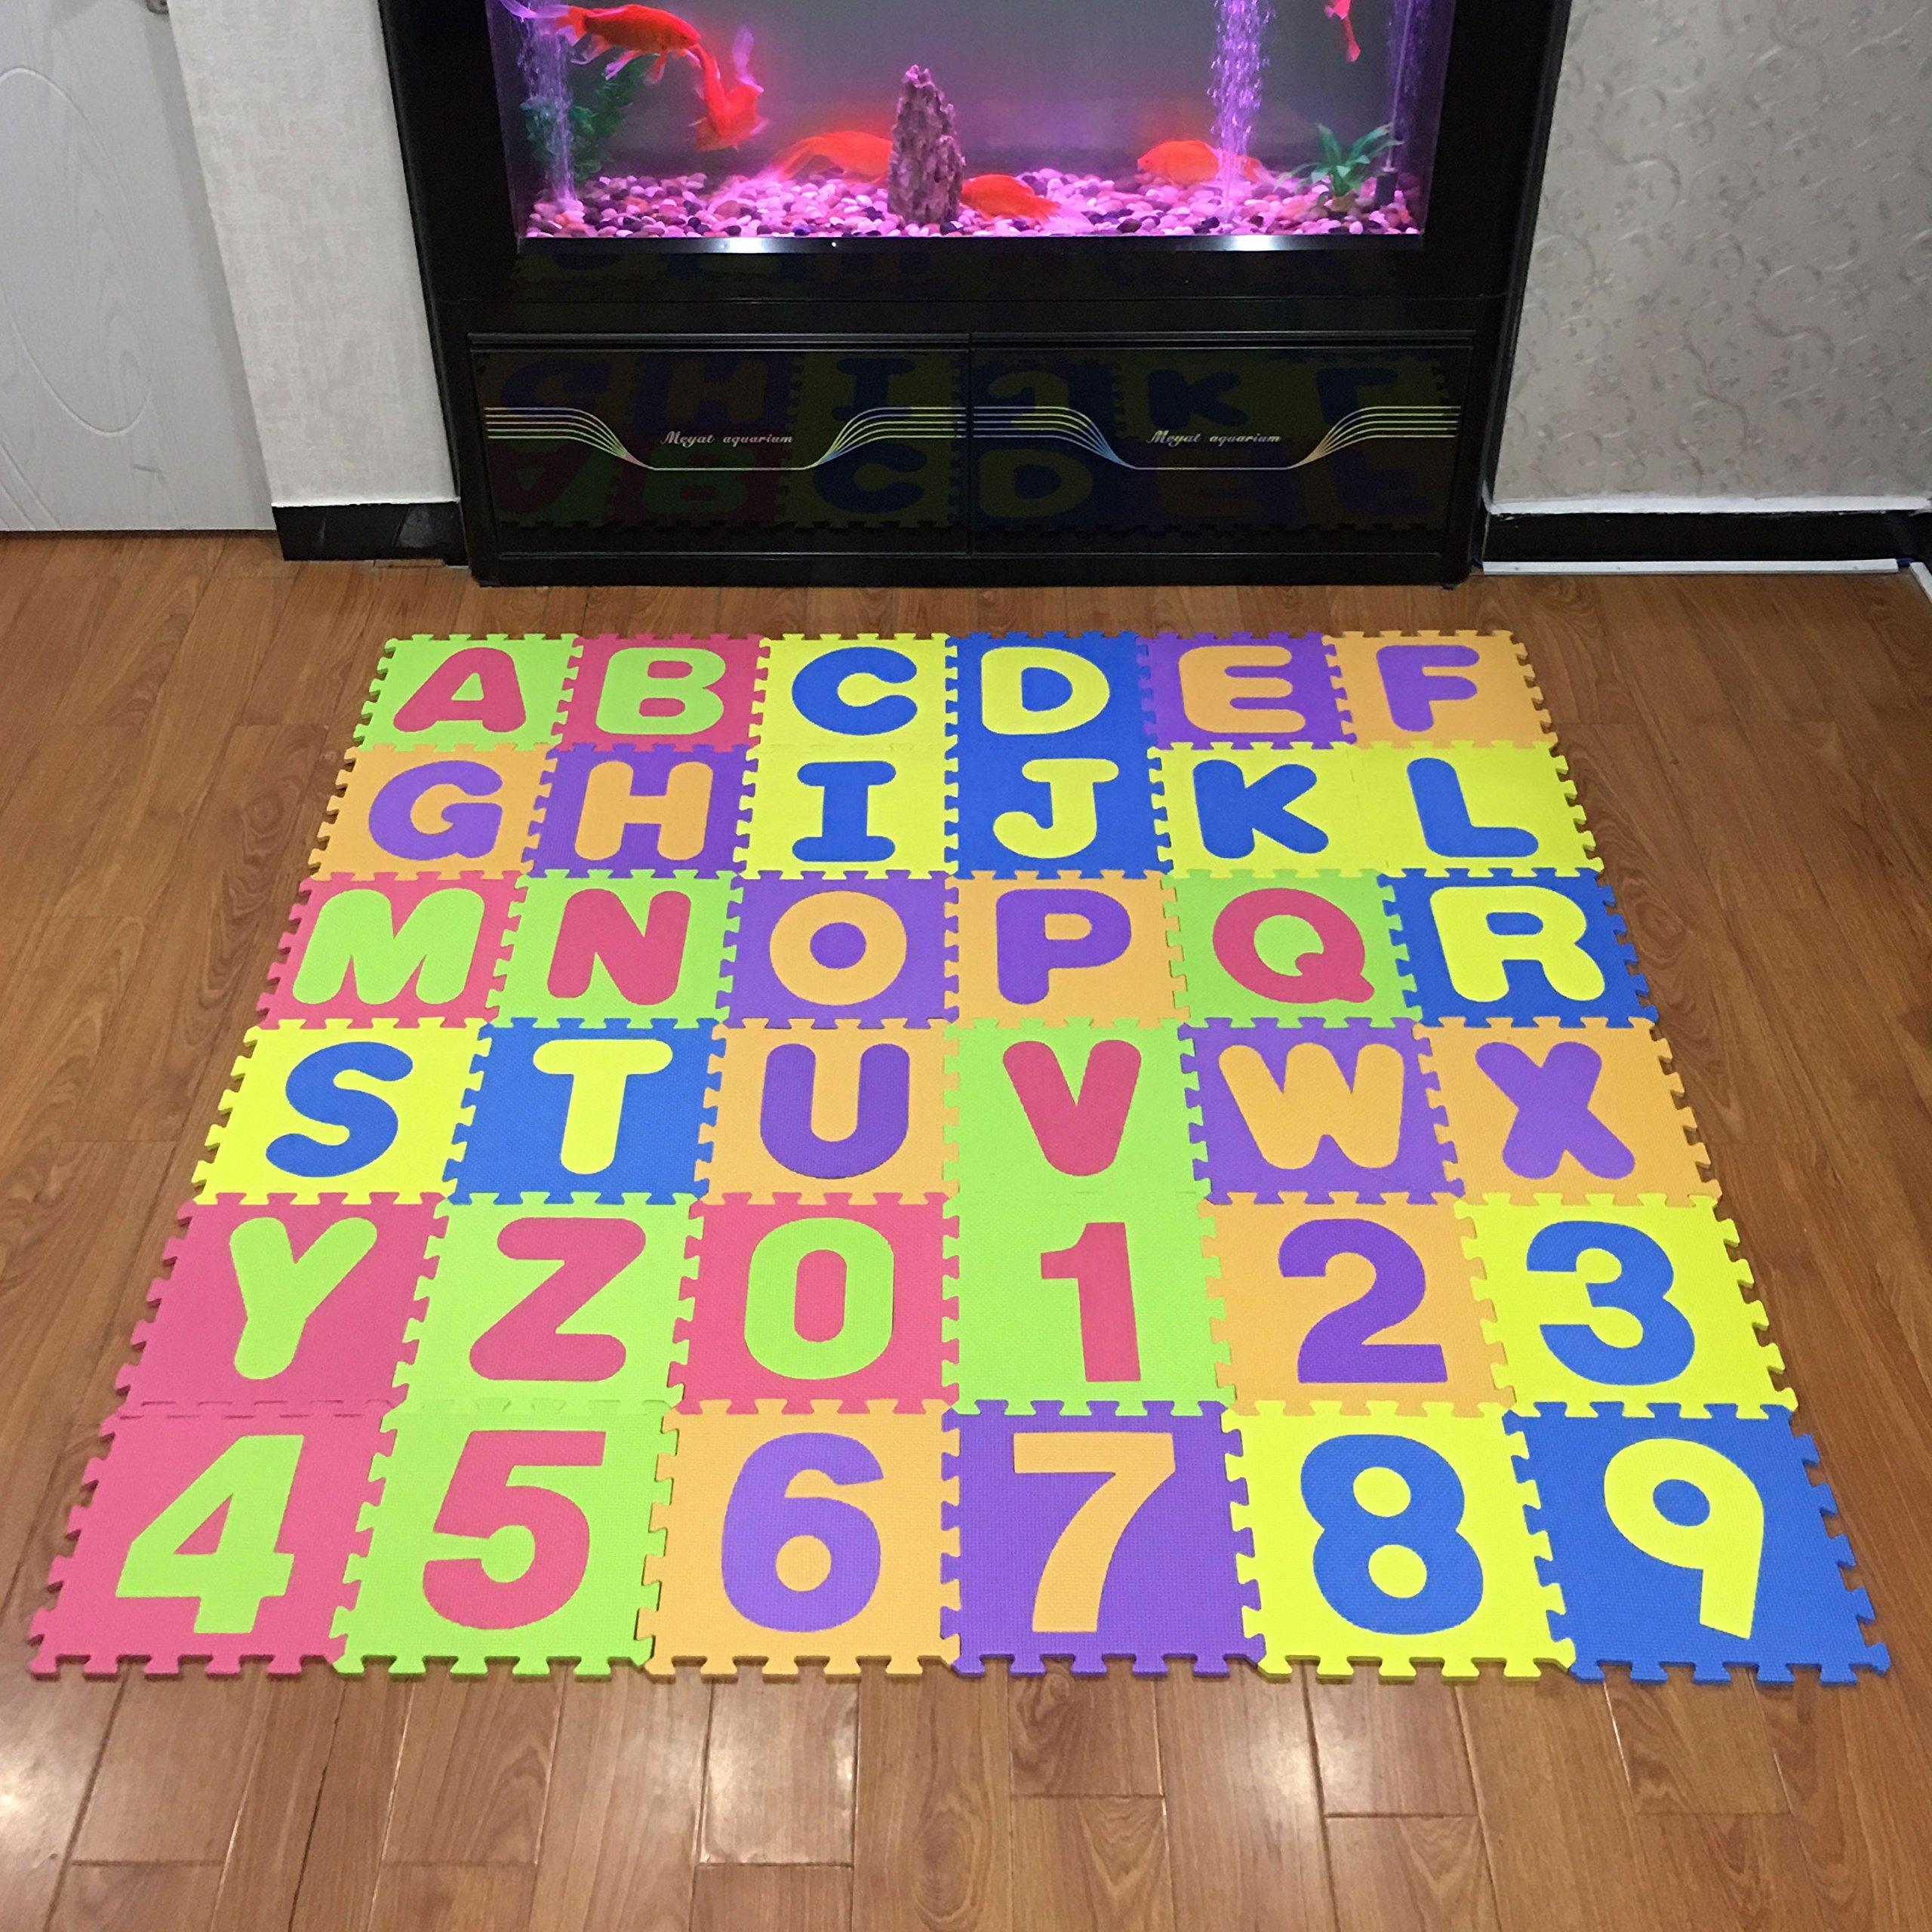 Puzzle Play Mat,Foam Floor Play Mat,Foam Interlocking Tiles,Alphabet & Number Foam Puzzle Mat,NON-TOXIC EVA 36 Piece Multi-Color Children Play & Exercise Mat (Large) (Large) by Chuanyue (Image #2)